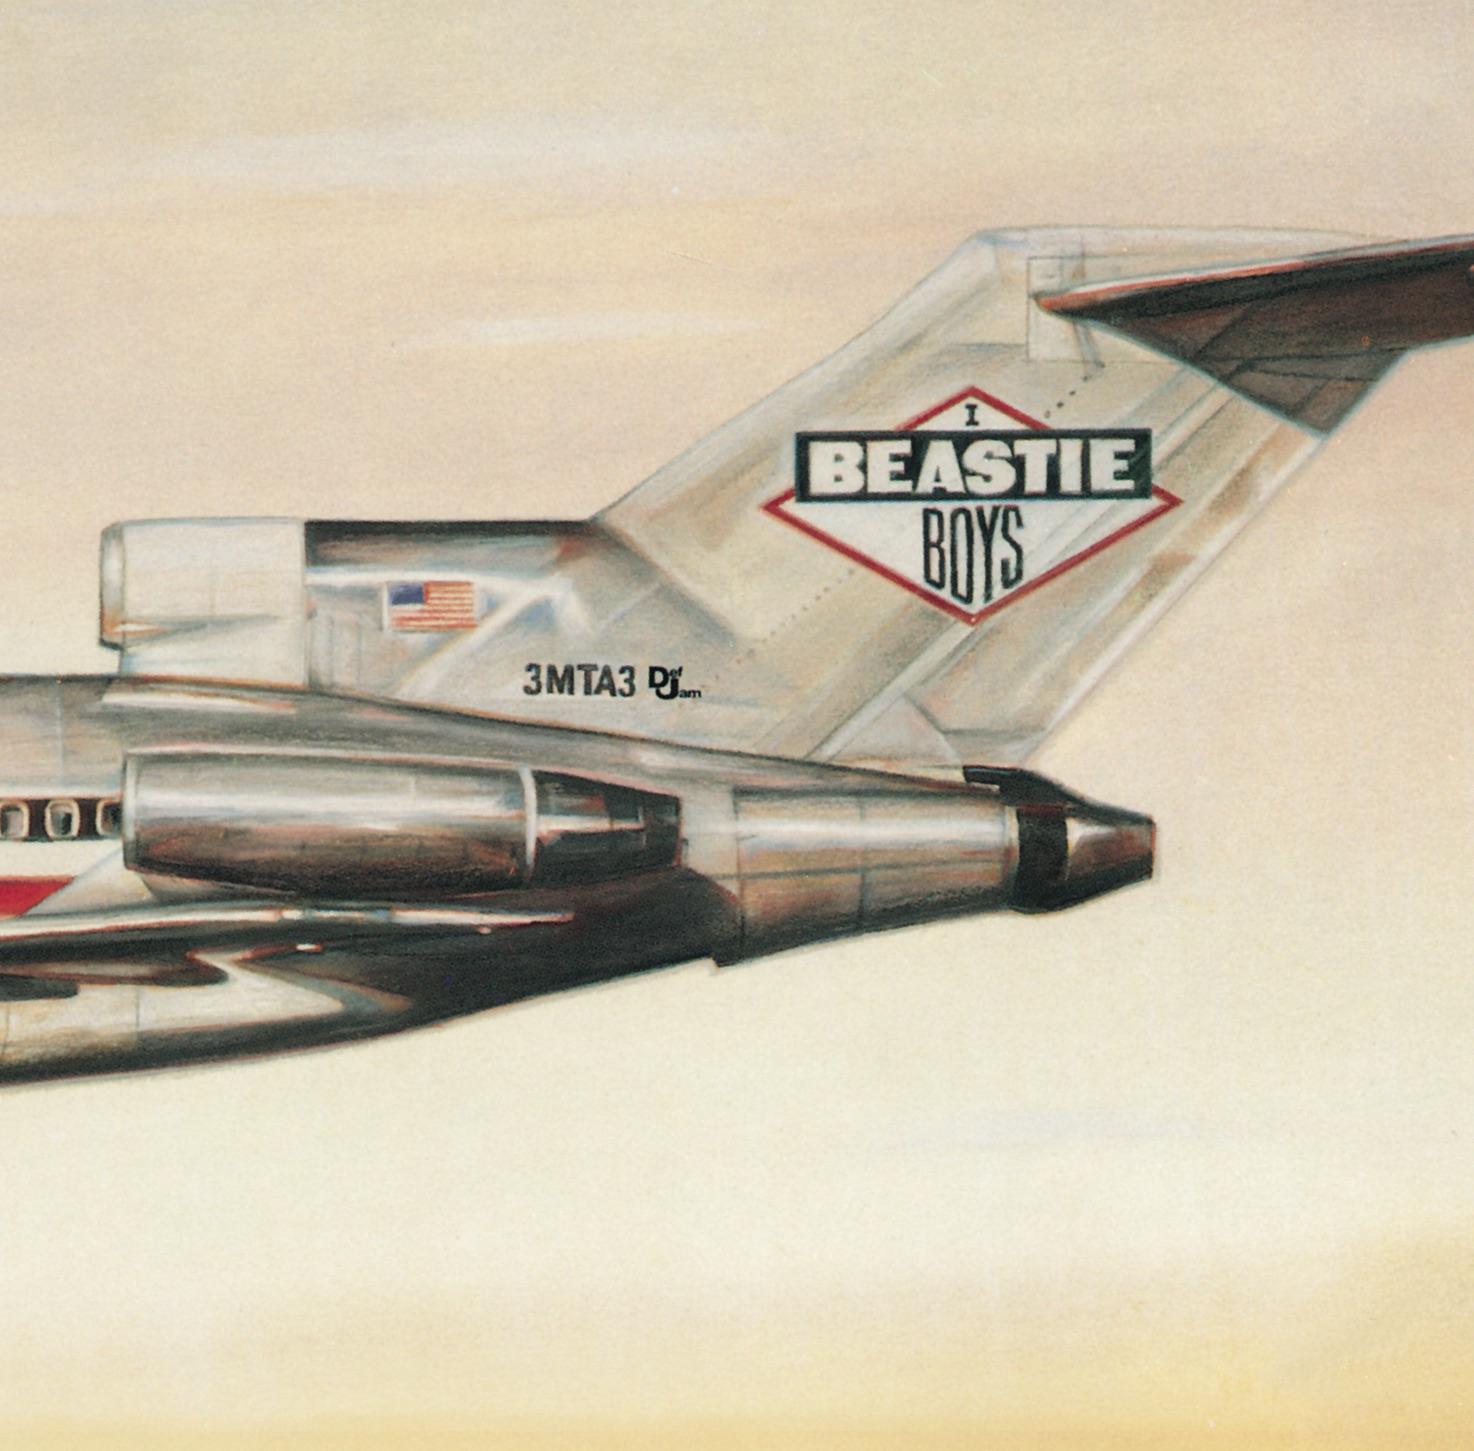 Das legendäre Beastie Boys-Artwork